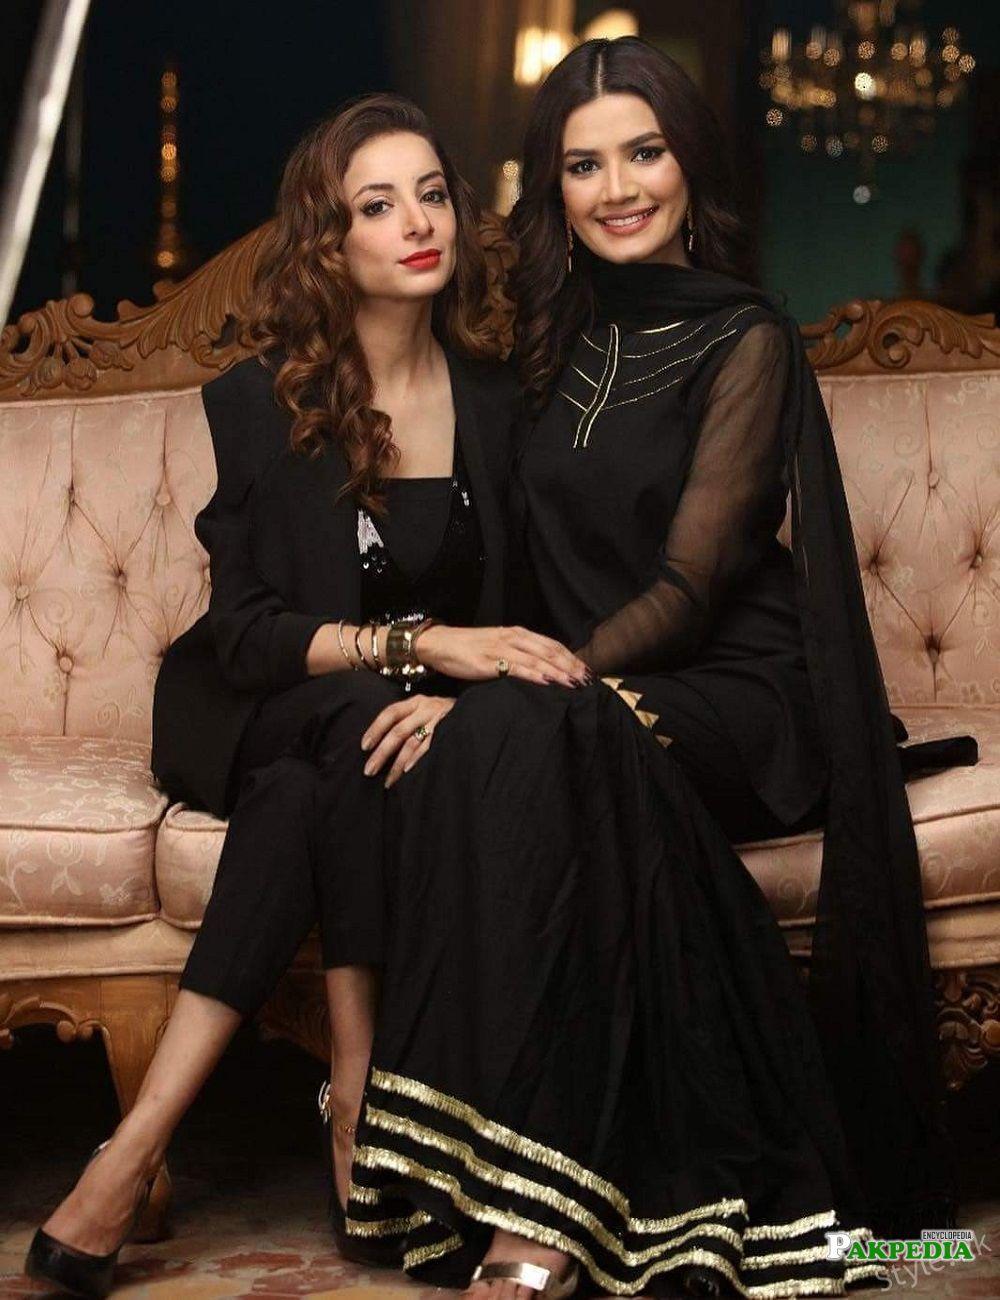 Kiran haq on set of her drama Naulakha